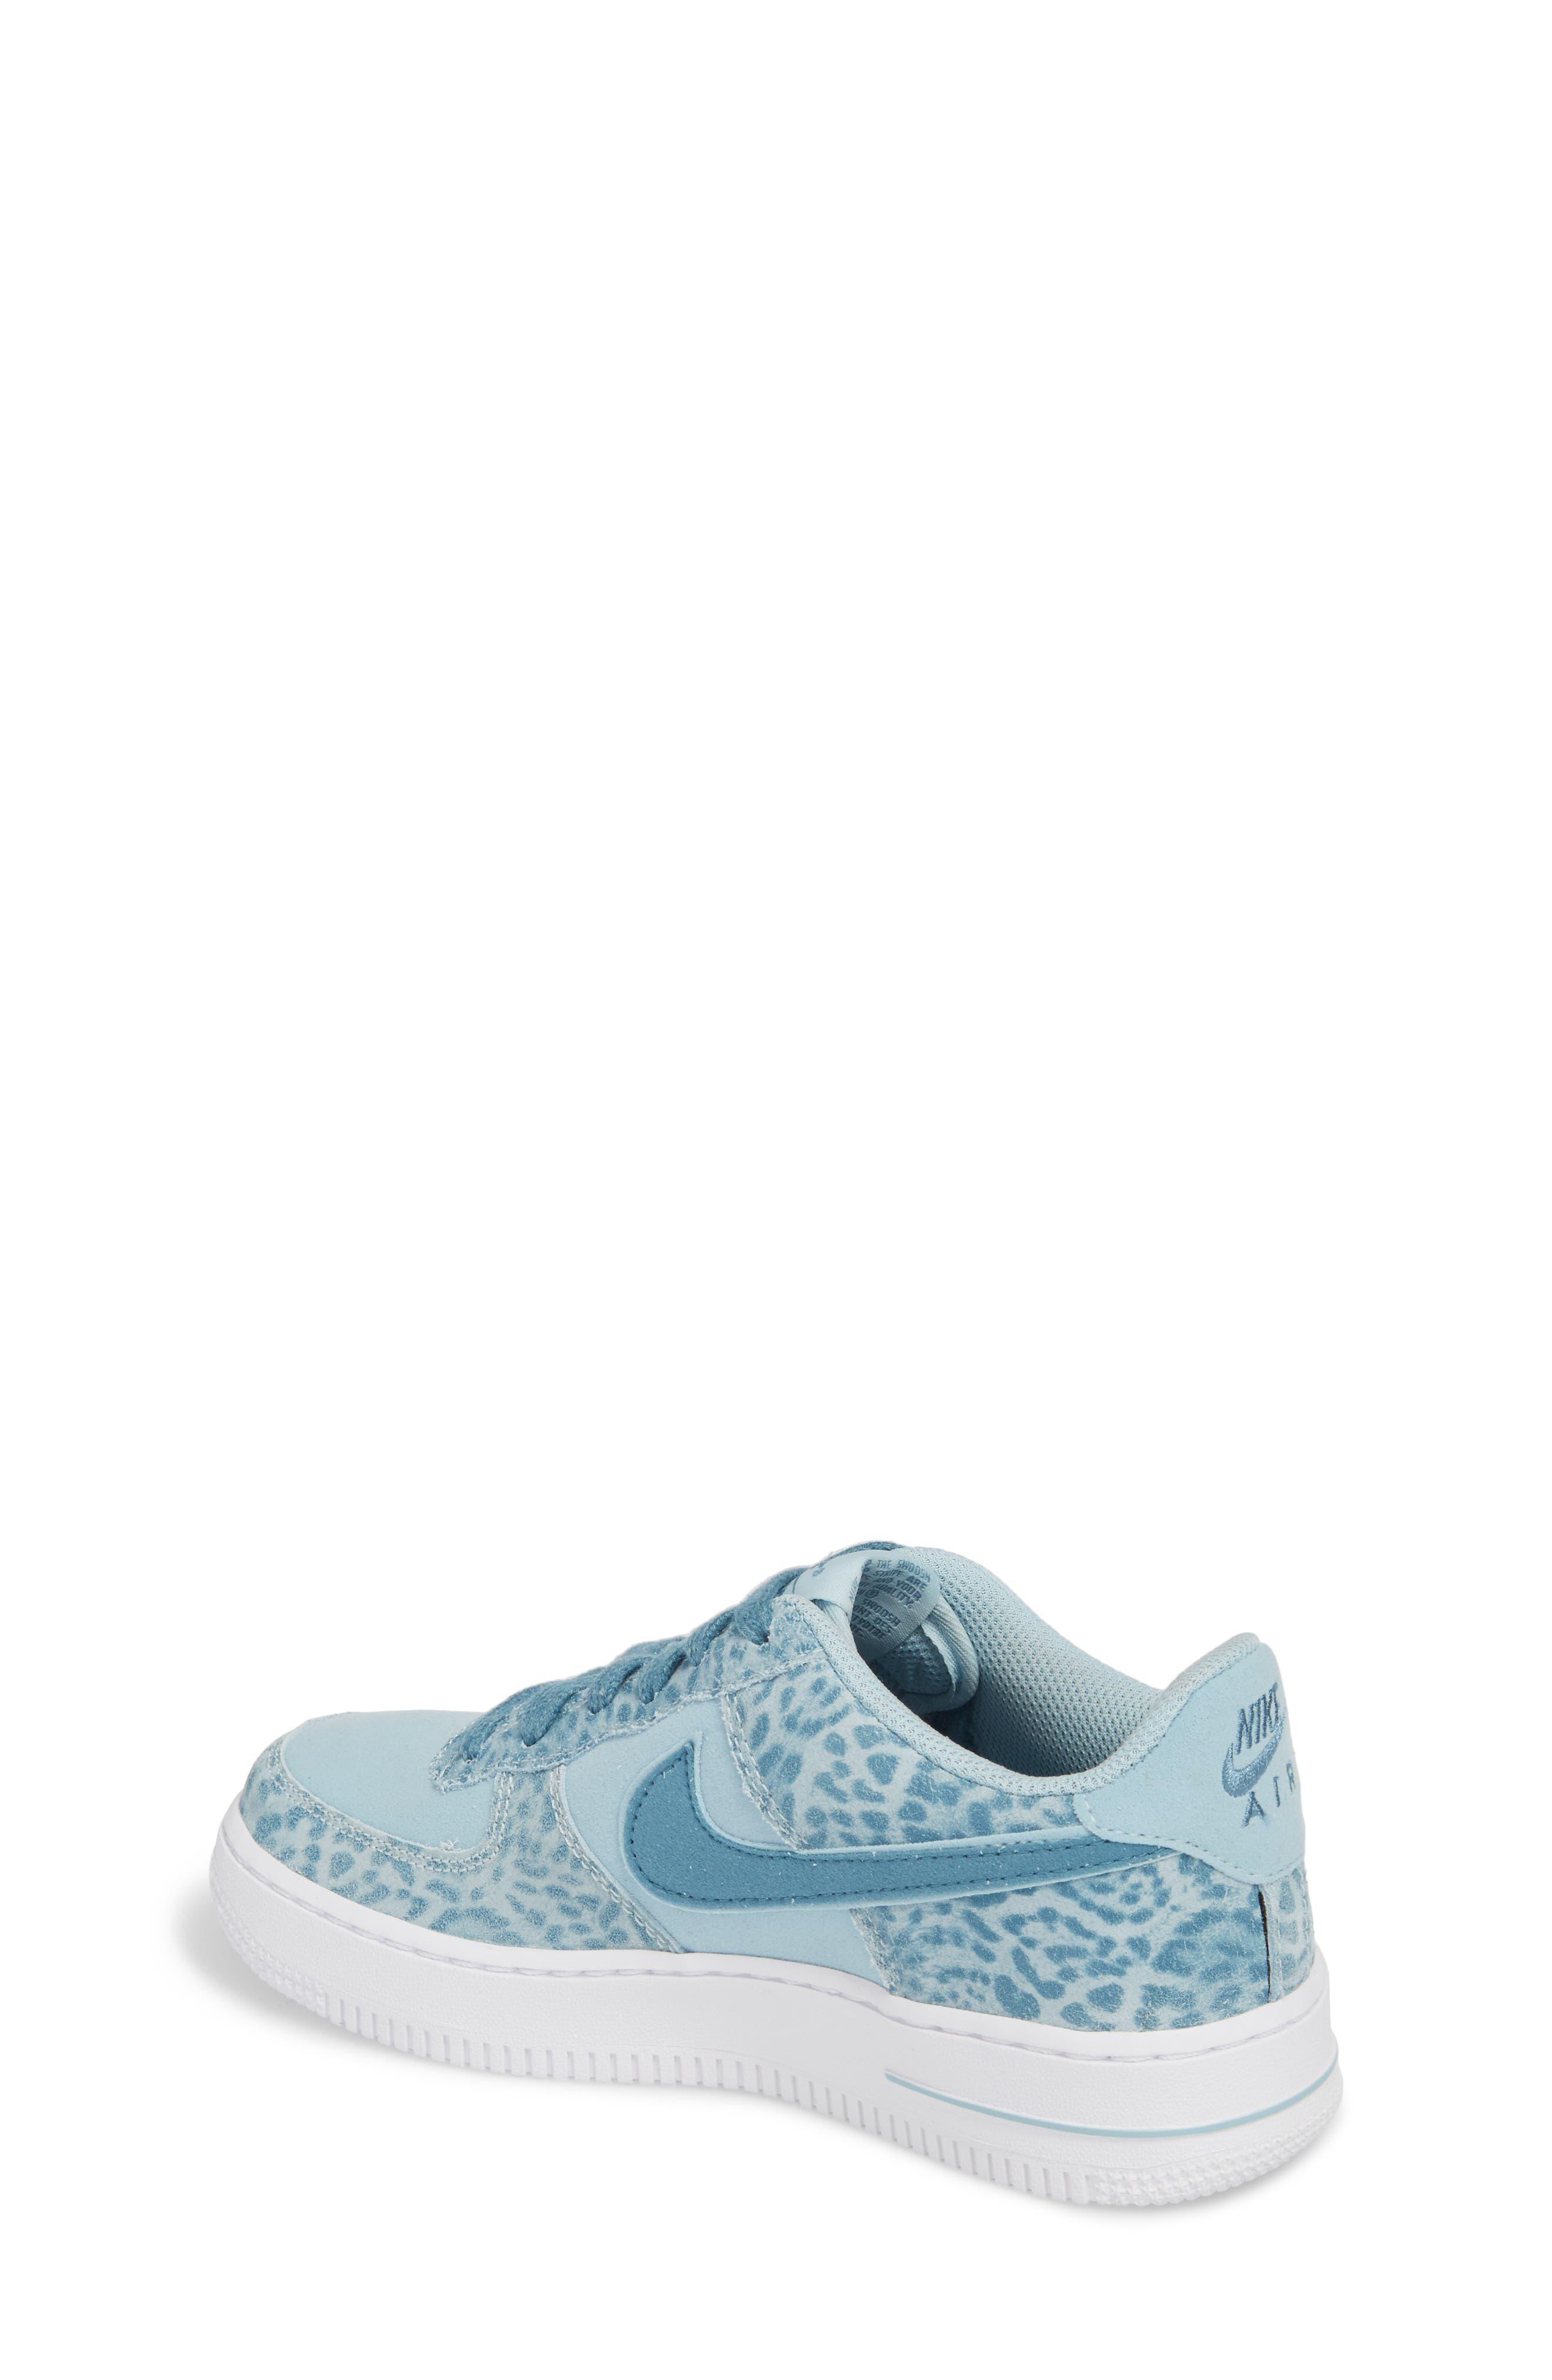 Air Force 1 LV8 Sneaker,                             Alternate thumbnail 7, color,